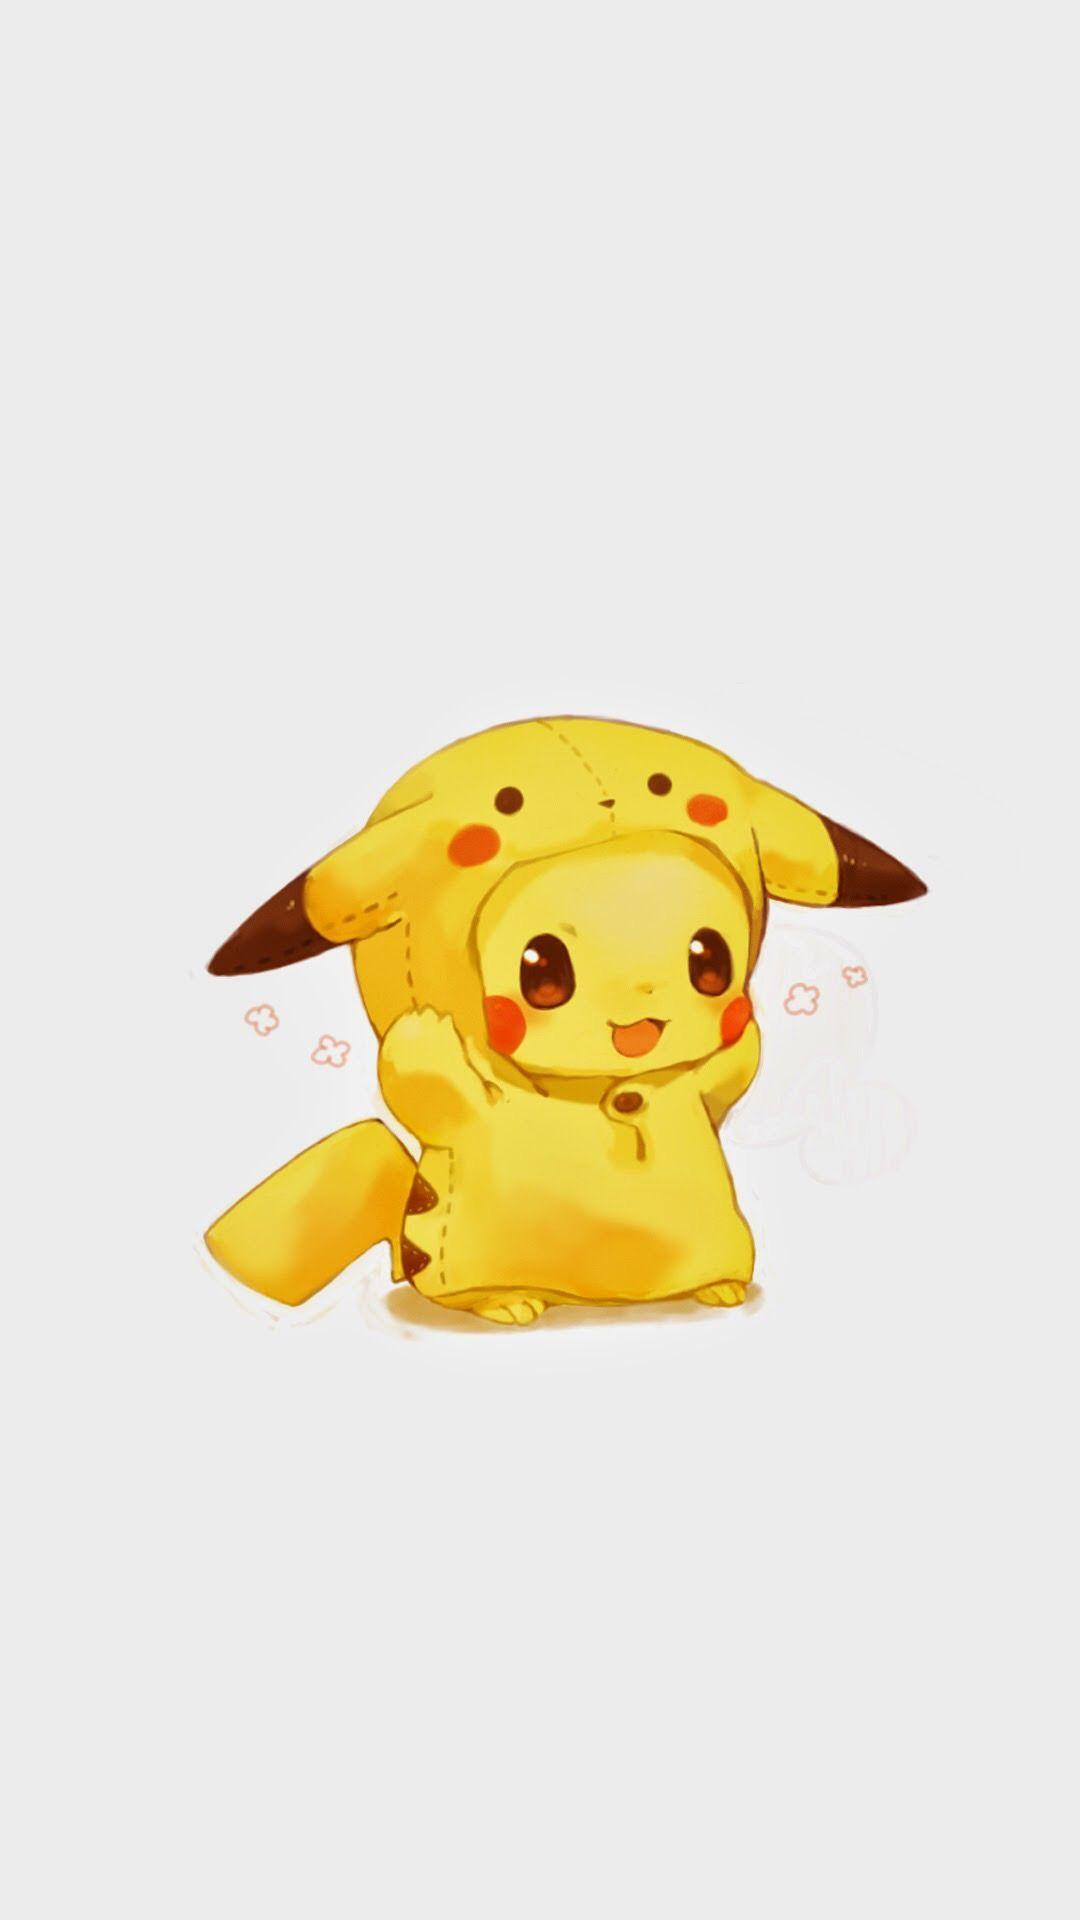 Cute Vulpix Wallpaper Girl Pikachu Wallpapers Top Free Girl Pikachu